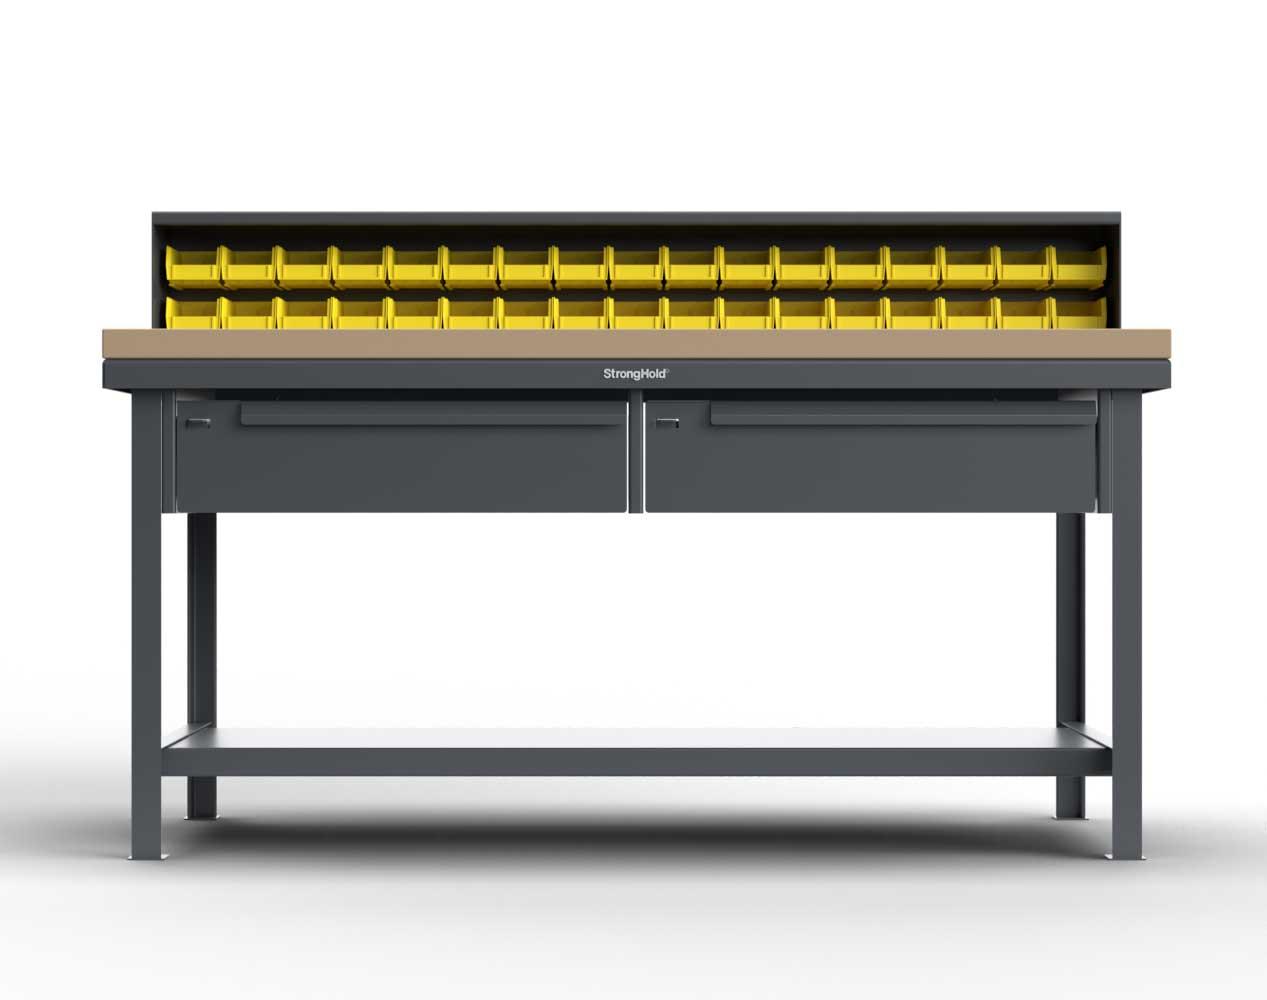 Extra Heavy Duty 7 GA Shop Table with Maple Top, 34 Bins, 2 Drawers, 1 Shelf, Riser Shelf – 72 In. W x 36 In. D x 34 In. H